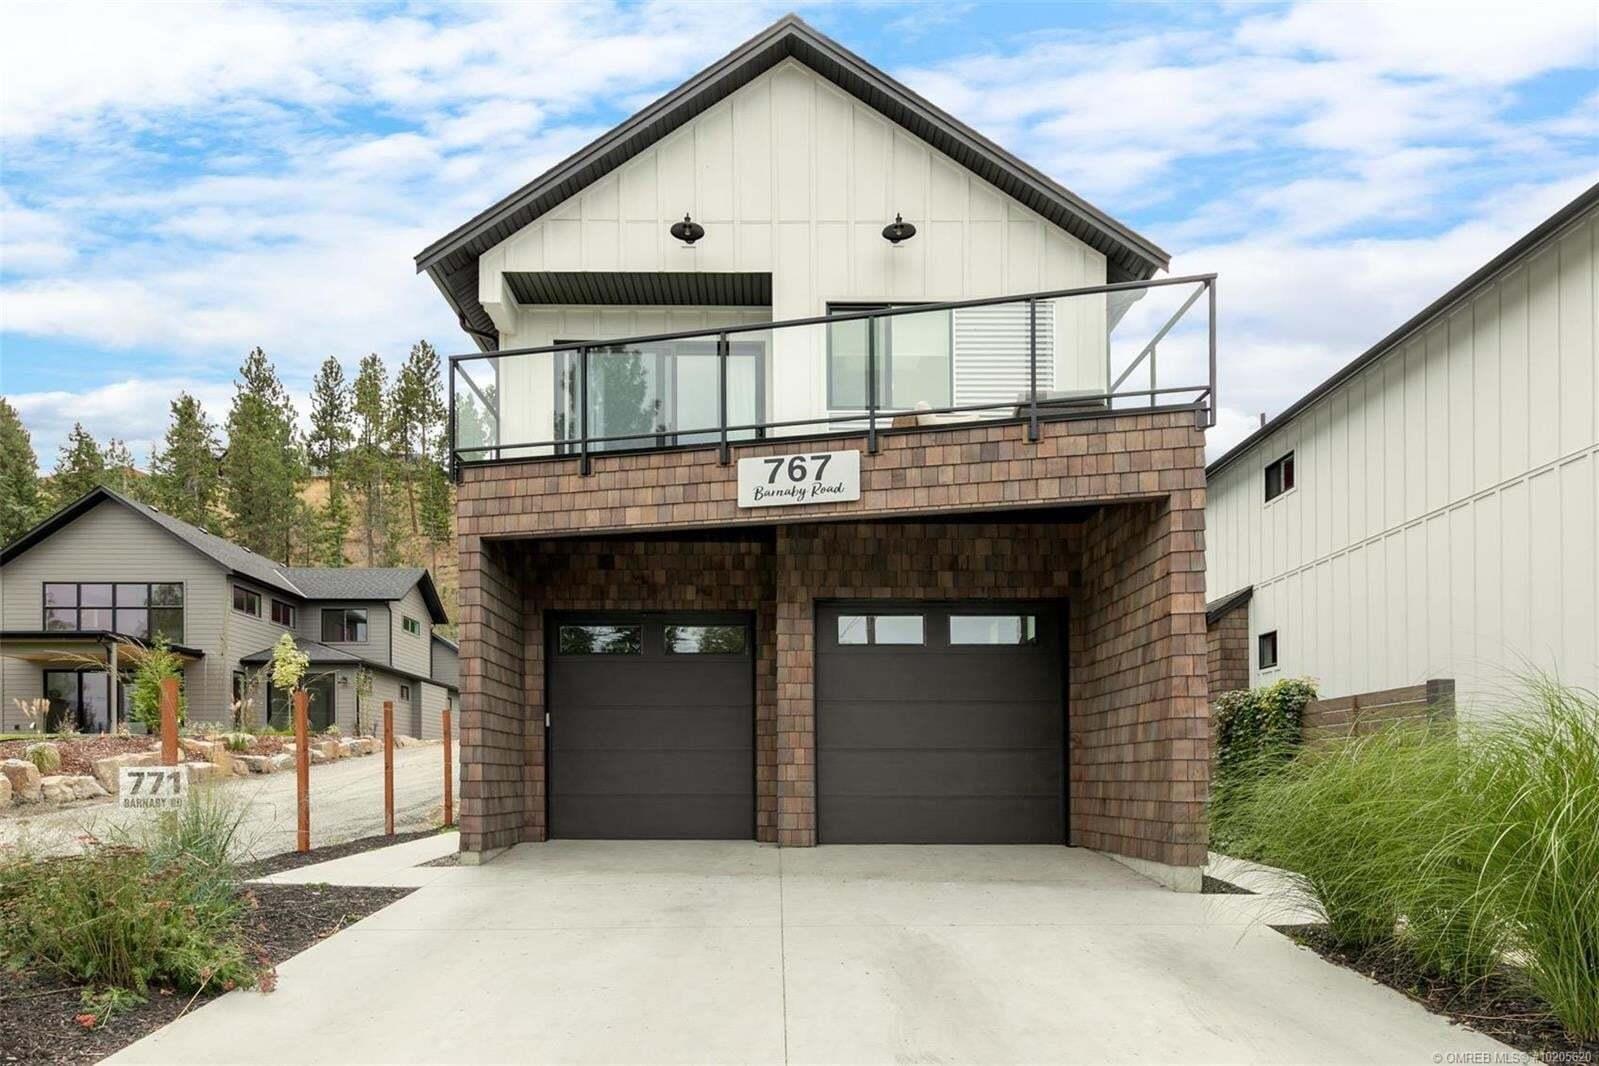 House for sale at 767 Barnaby Rd Kelowna British Columbia - MLS: 10205620